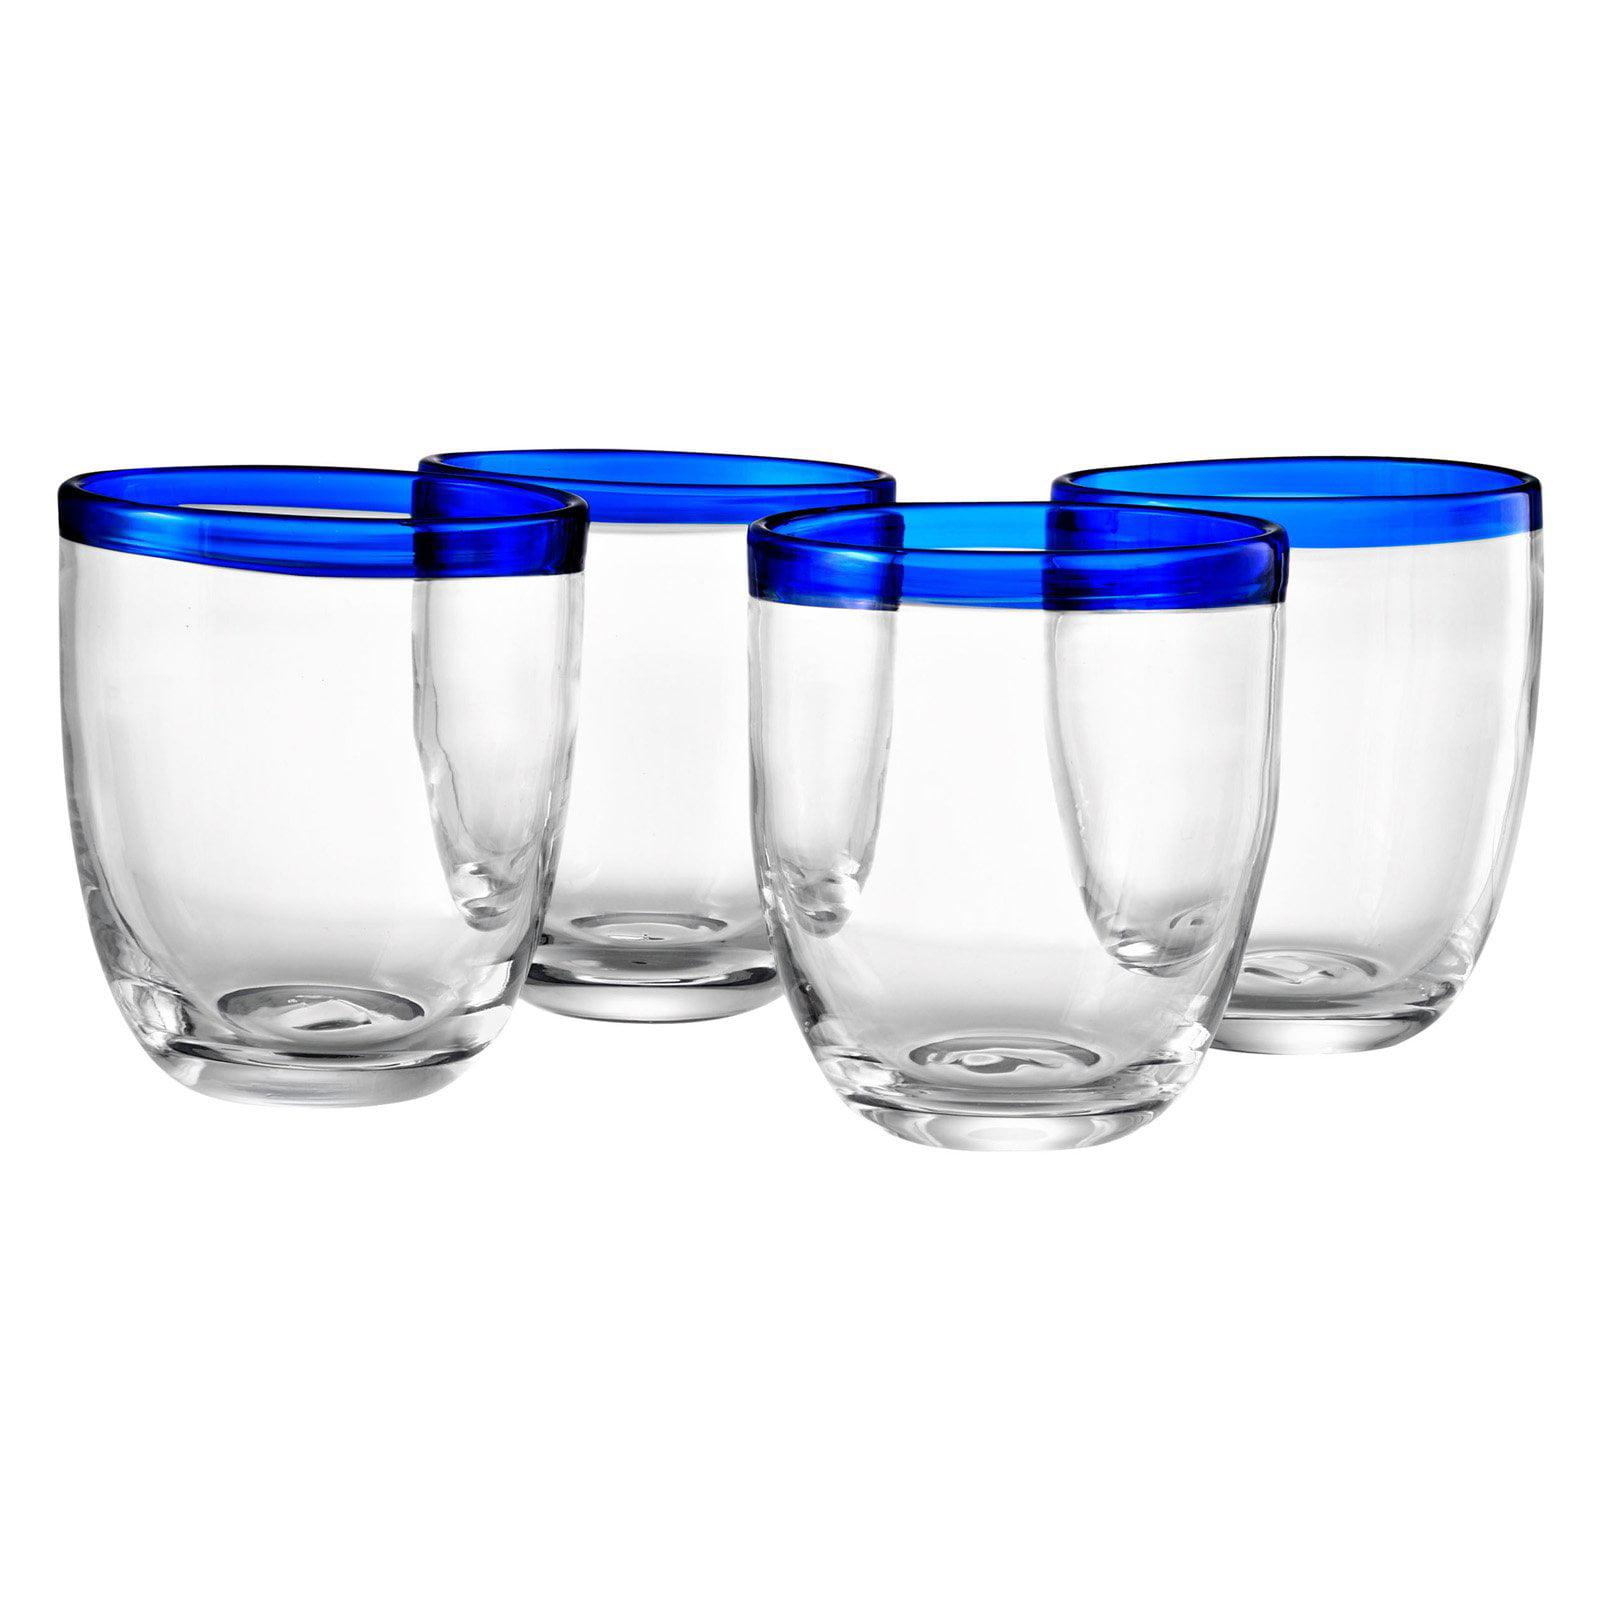 Artland Inc. Festival DOF Glasses - Set of 4